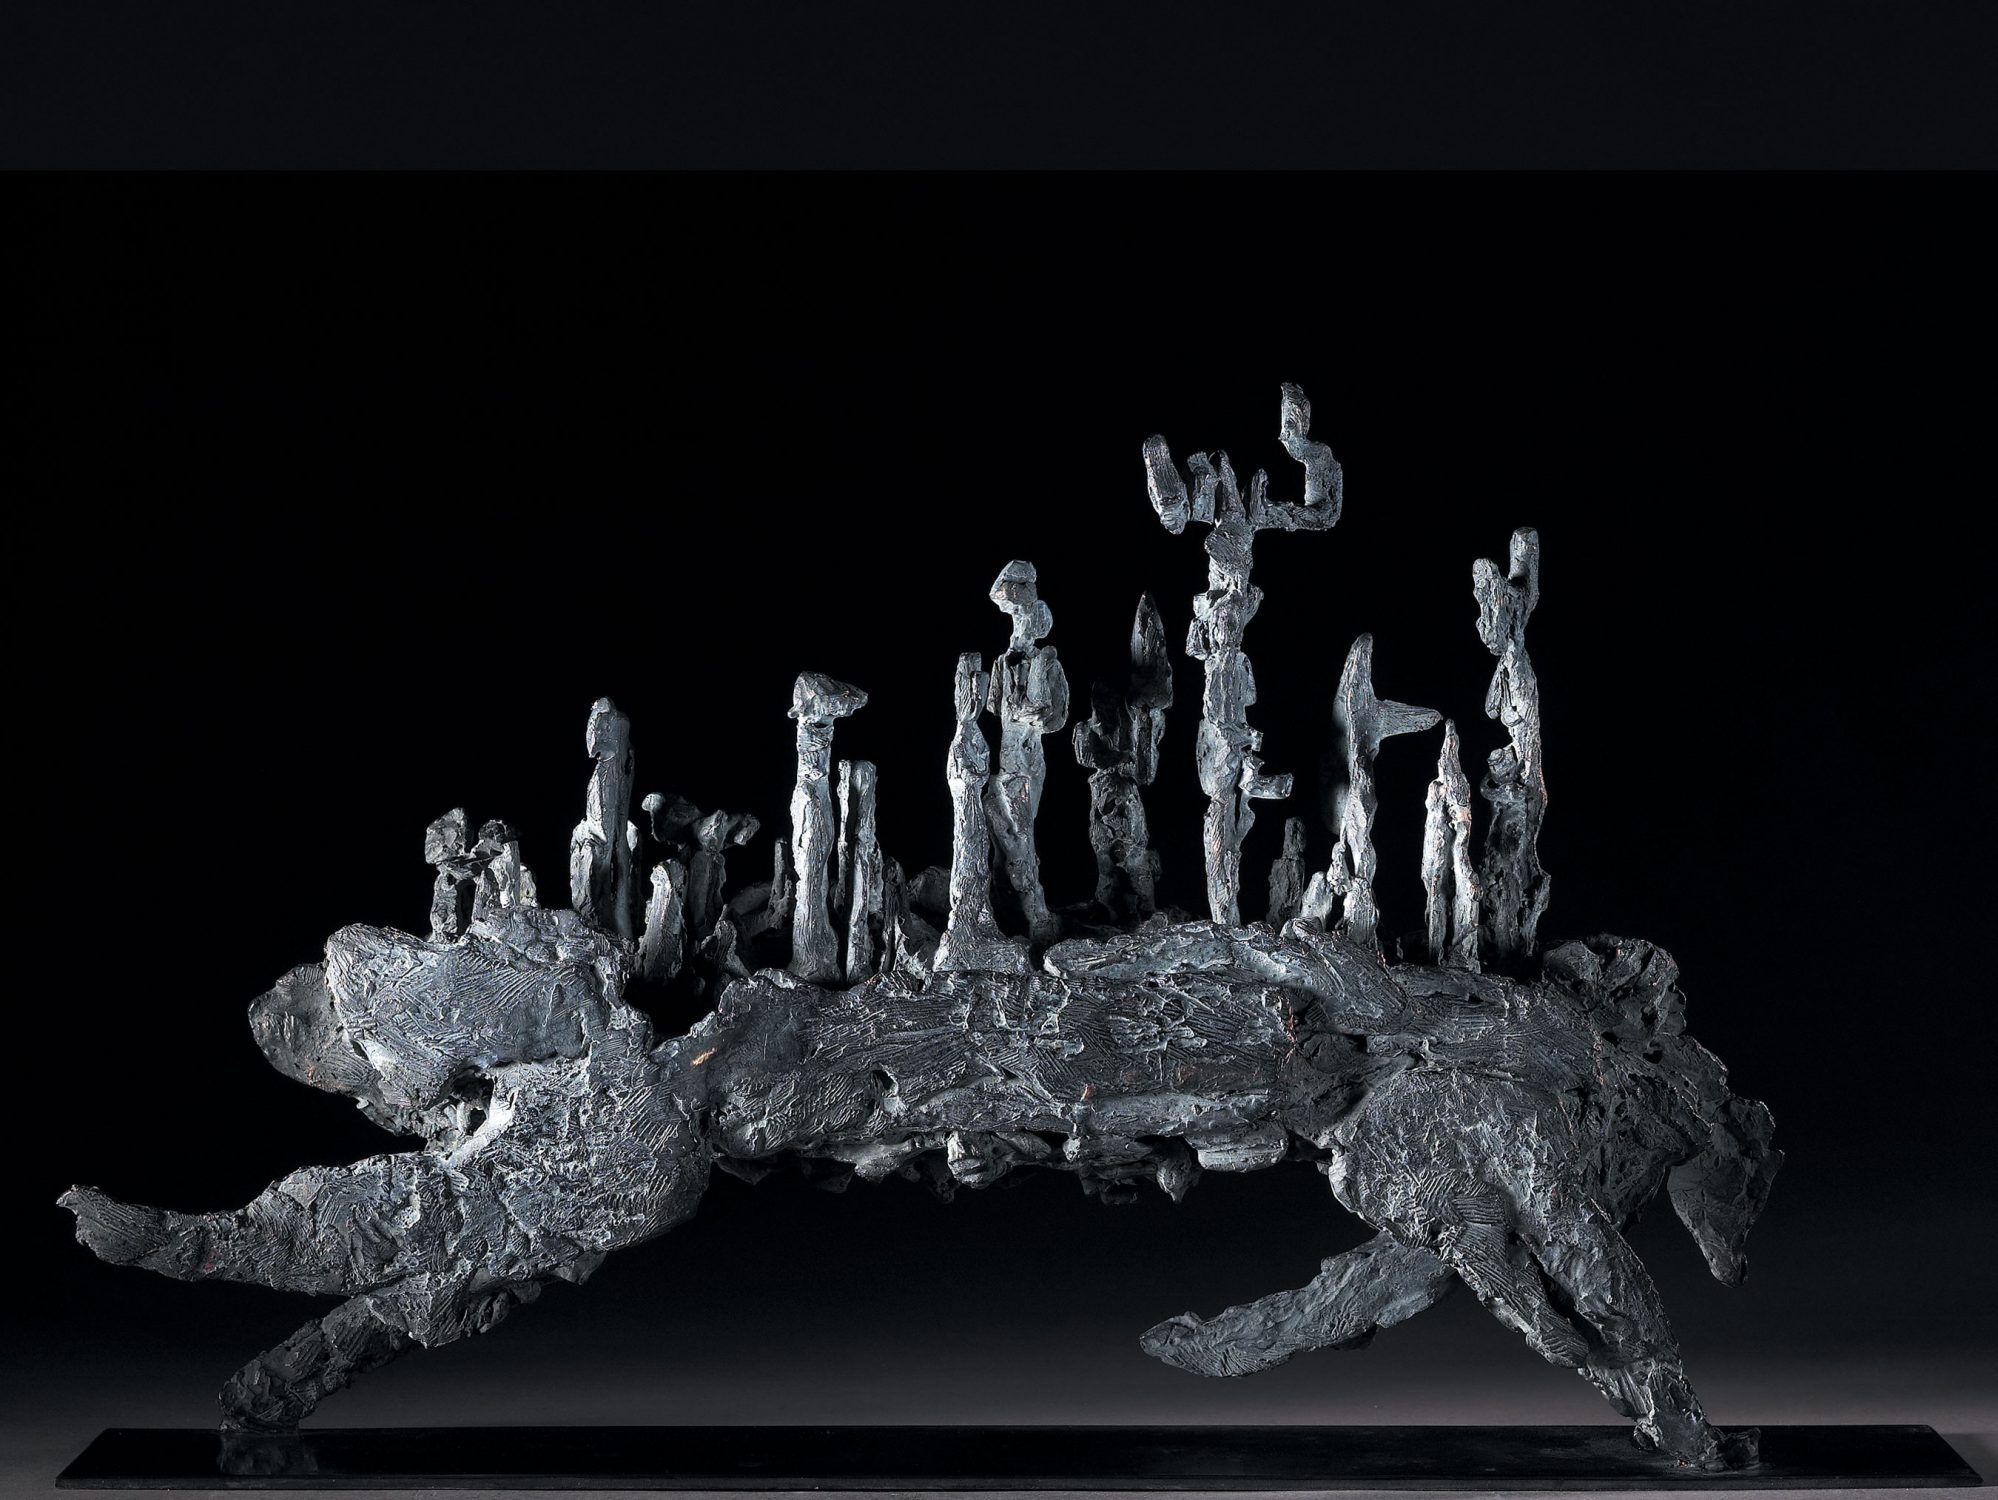 ours monture culture bronze sculpture art nature animal